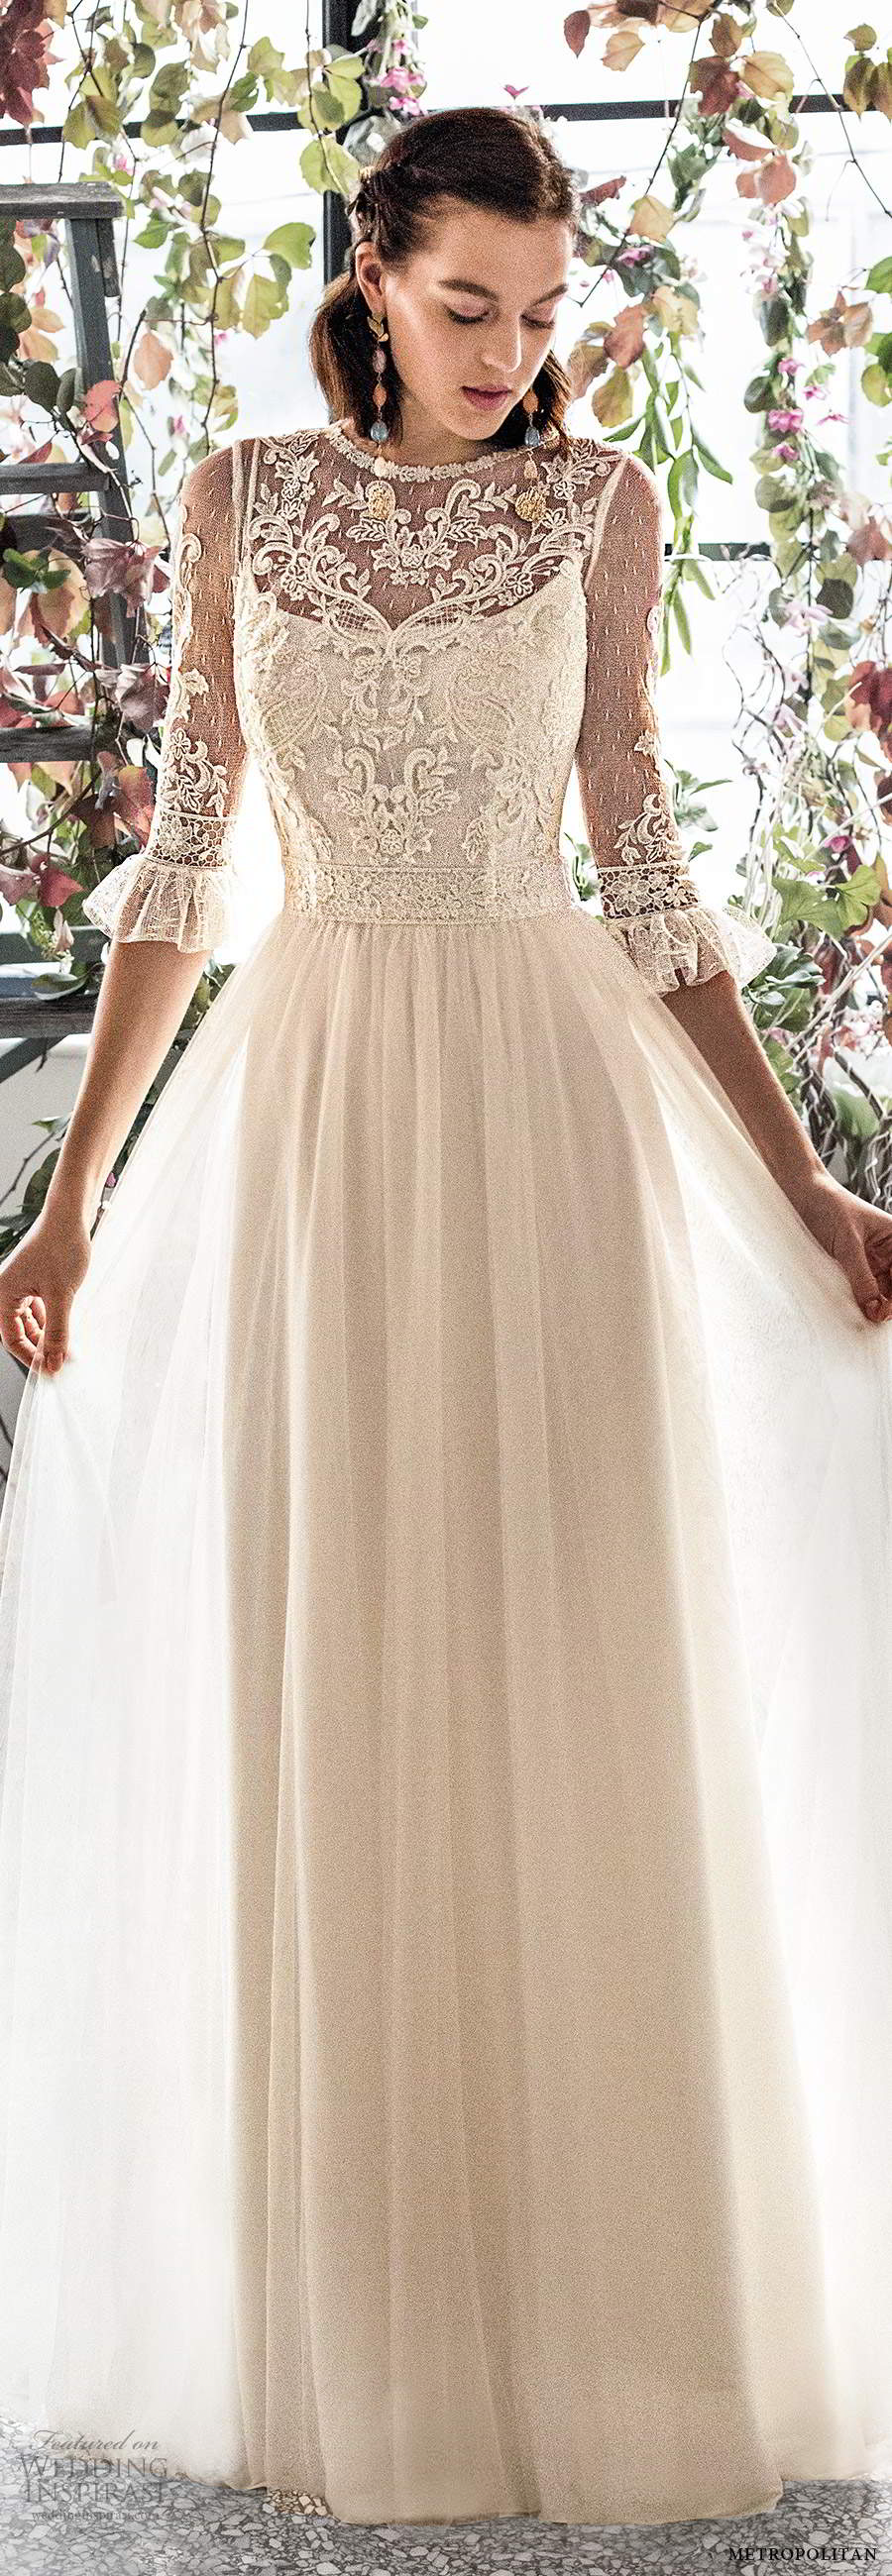 metropolitan spring 2020 bridal illusion 3 quarter sleeves jewel neckline embellished lace bodice a line wedding dress chapel train (18) mv